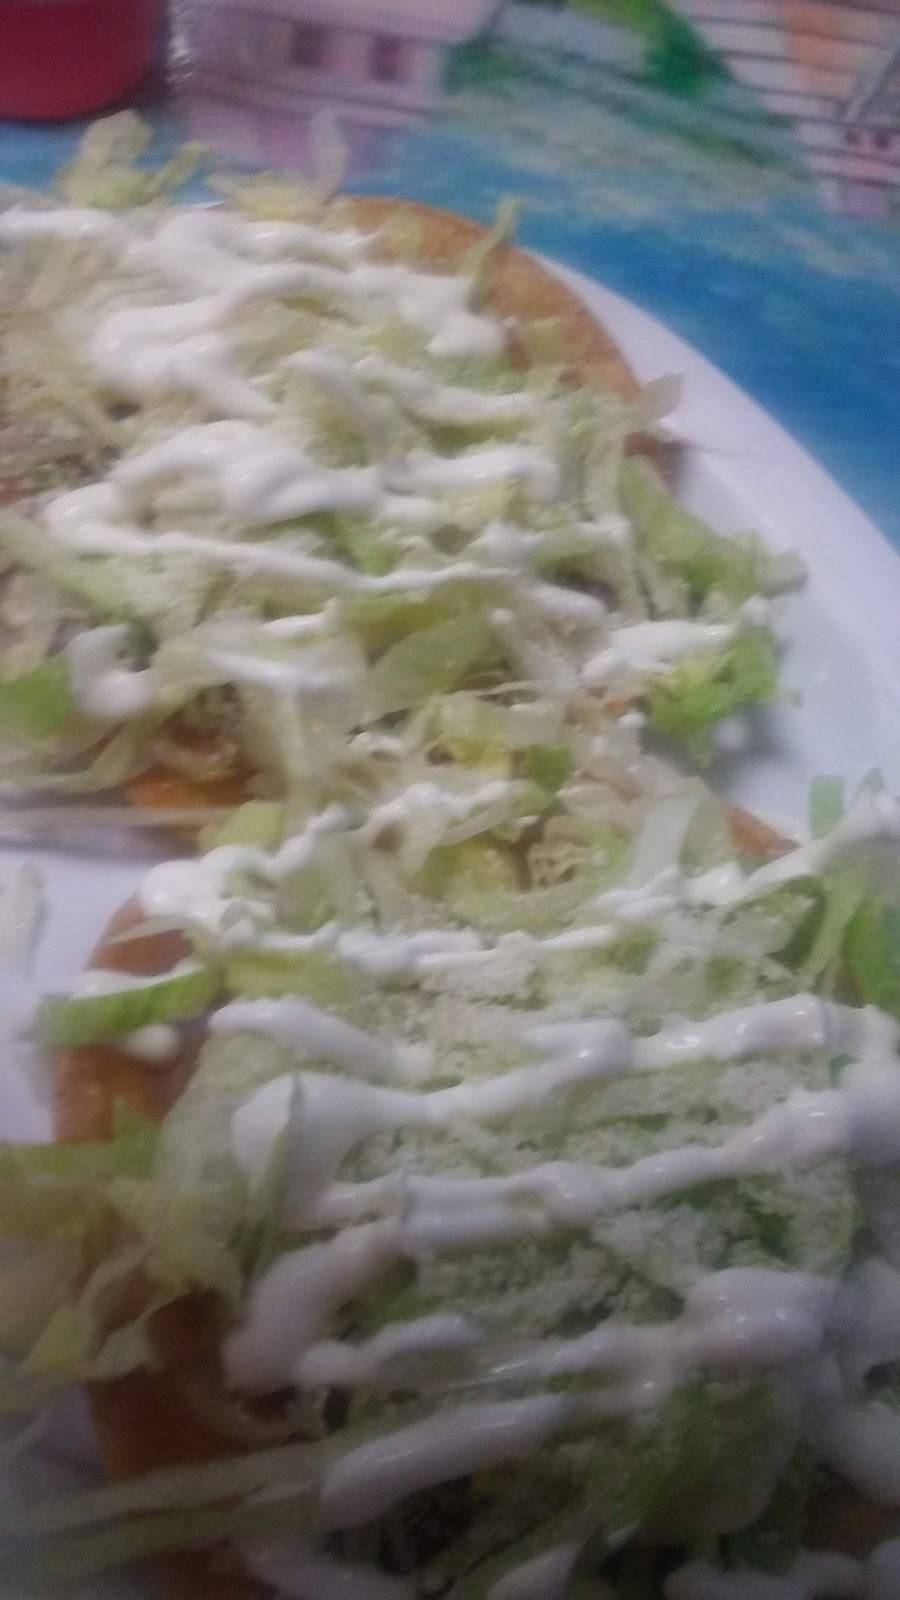 Taqueria El Jalapeno | restaurant | 124 E 4th St, Bridgeport, PA 19405, USA | 4842968704 OR +1 484-296-8704